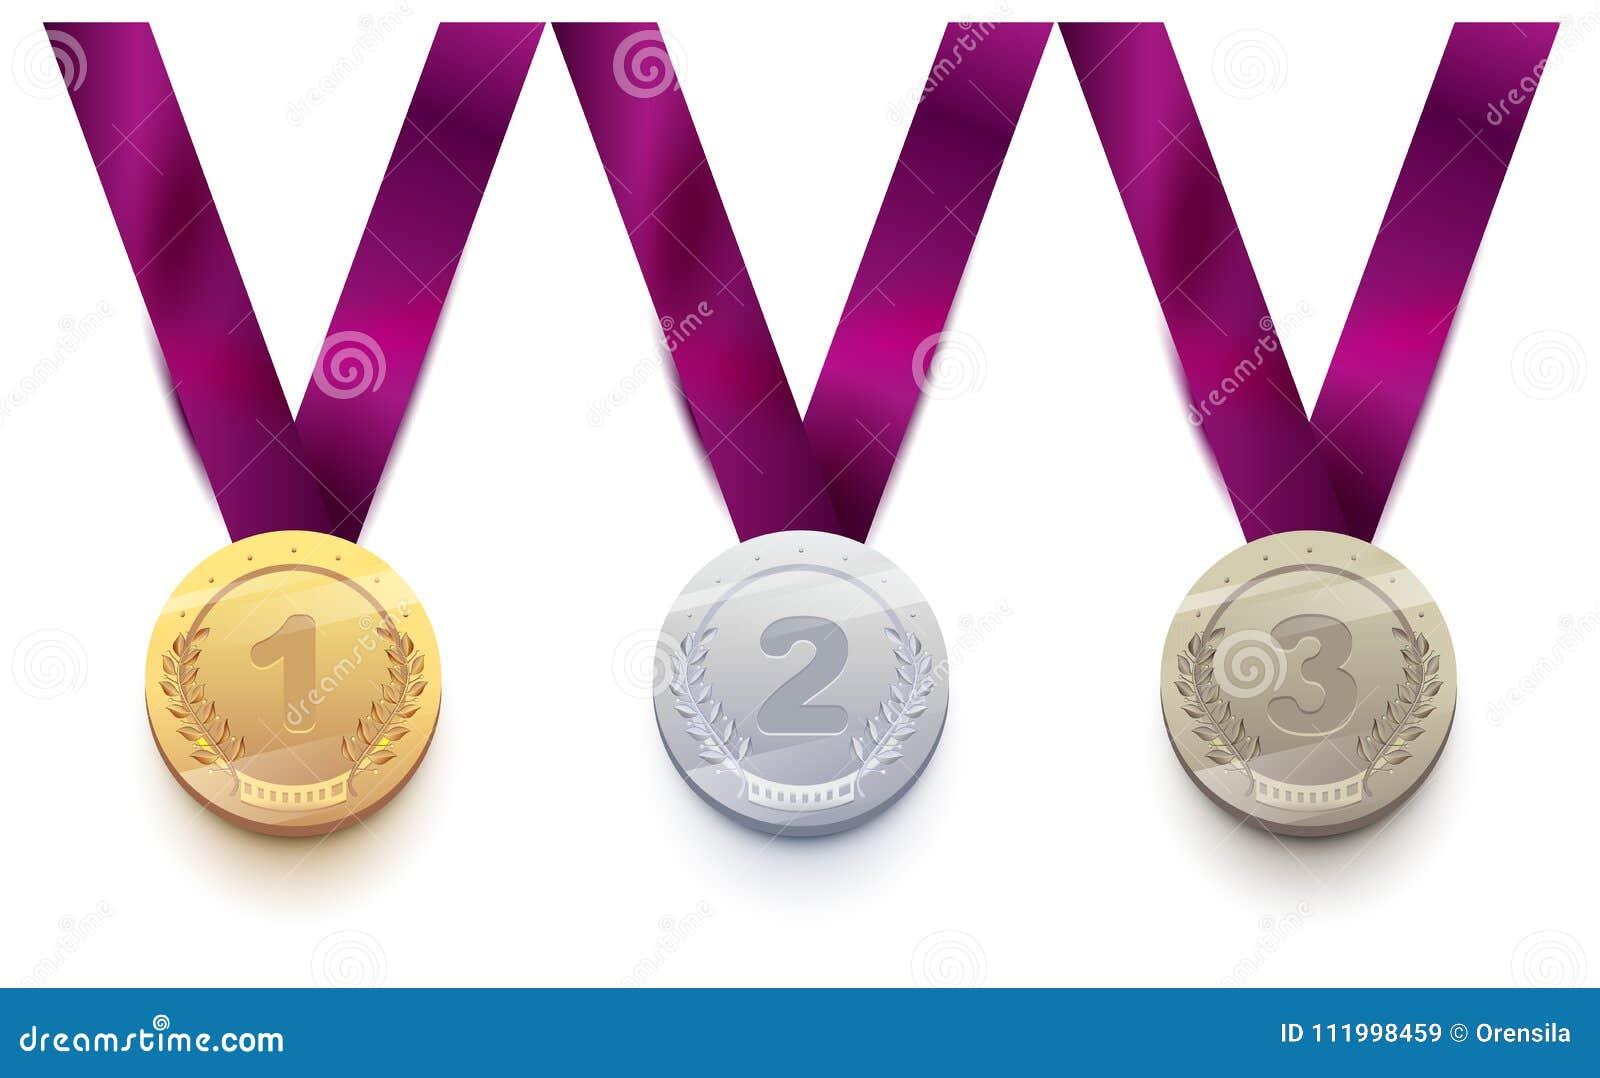 Vastgestelde sportmedaille 1 goud, 2 zilver, brons 3